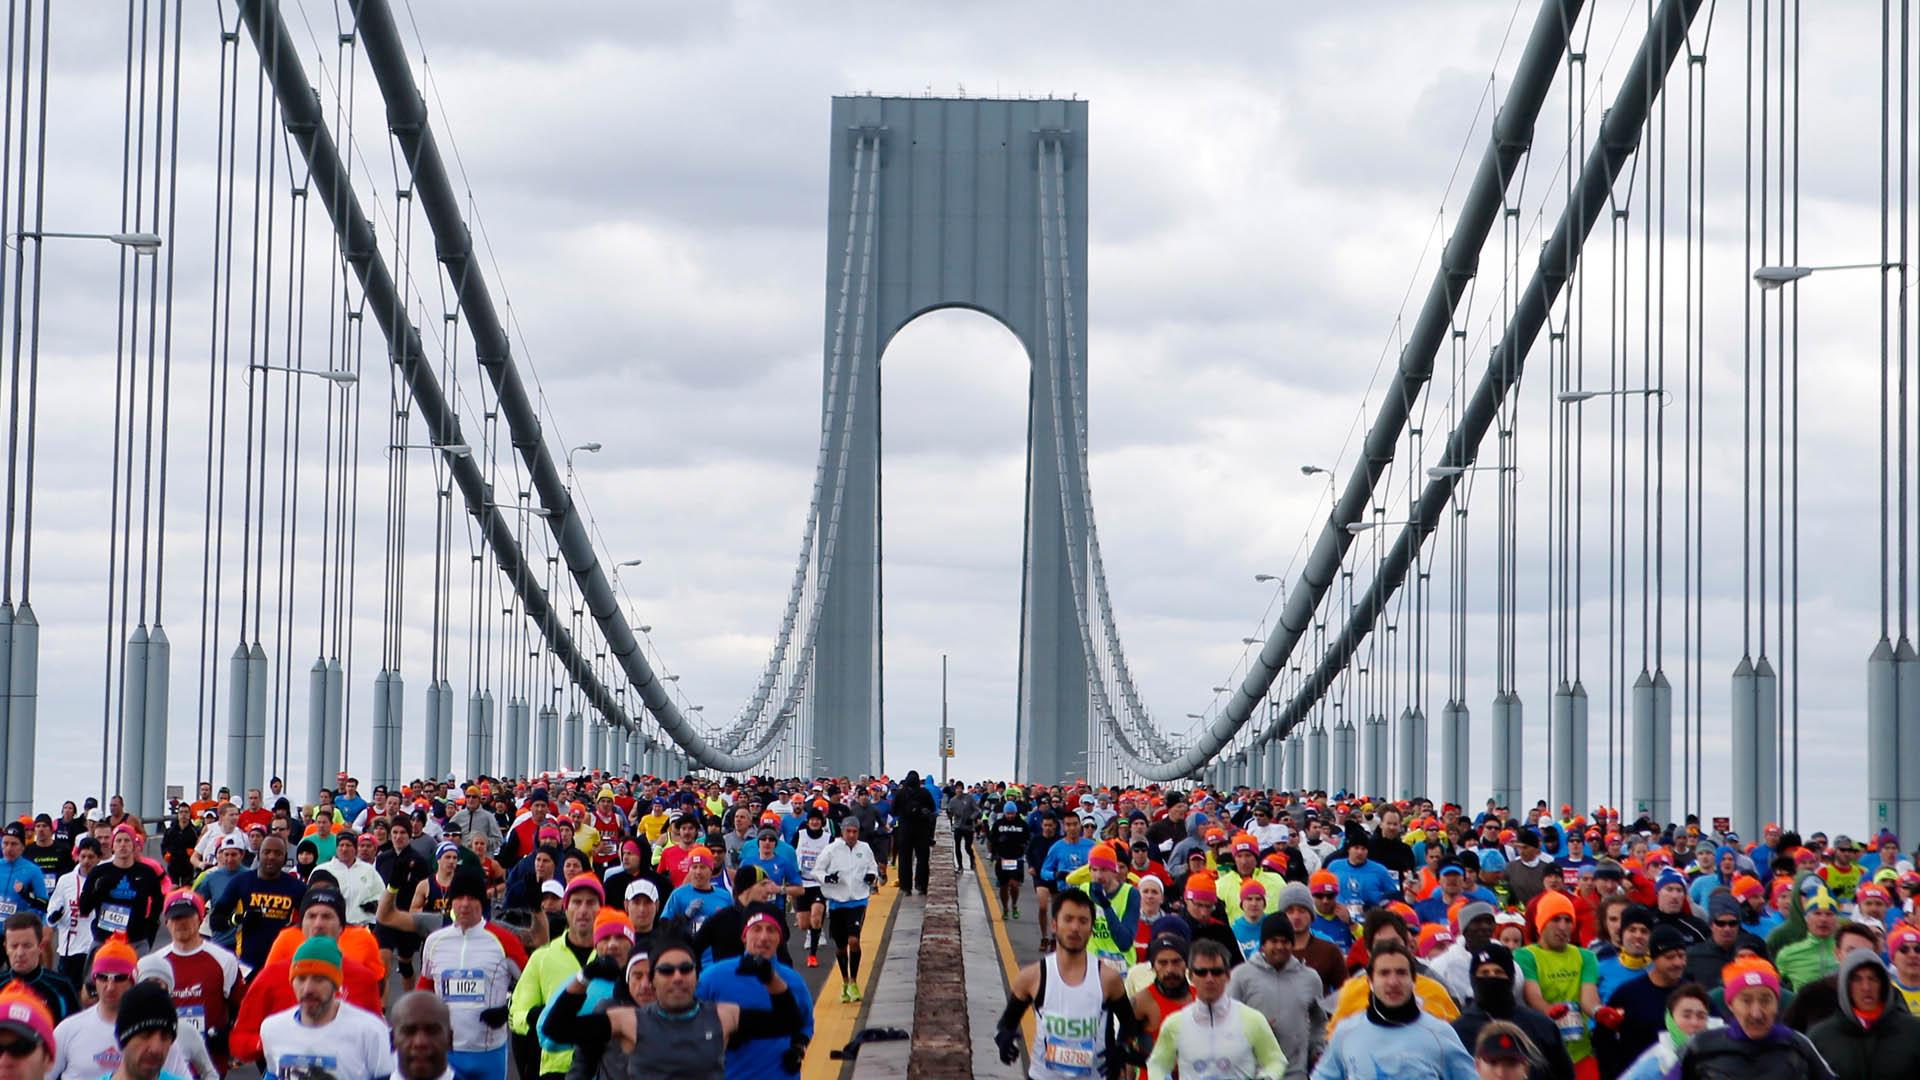 New York Events and Event Calendar | NYC.com - New York's ...